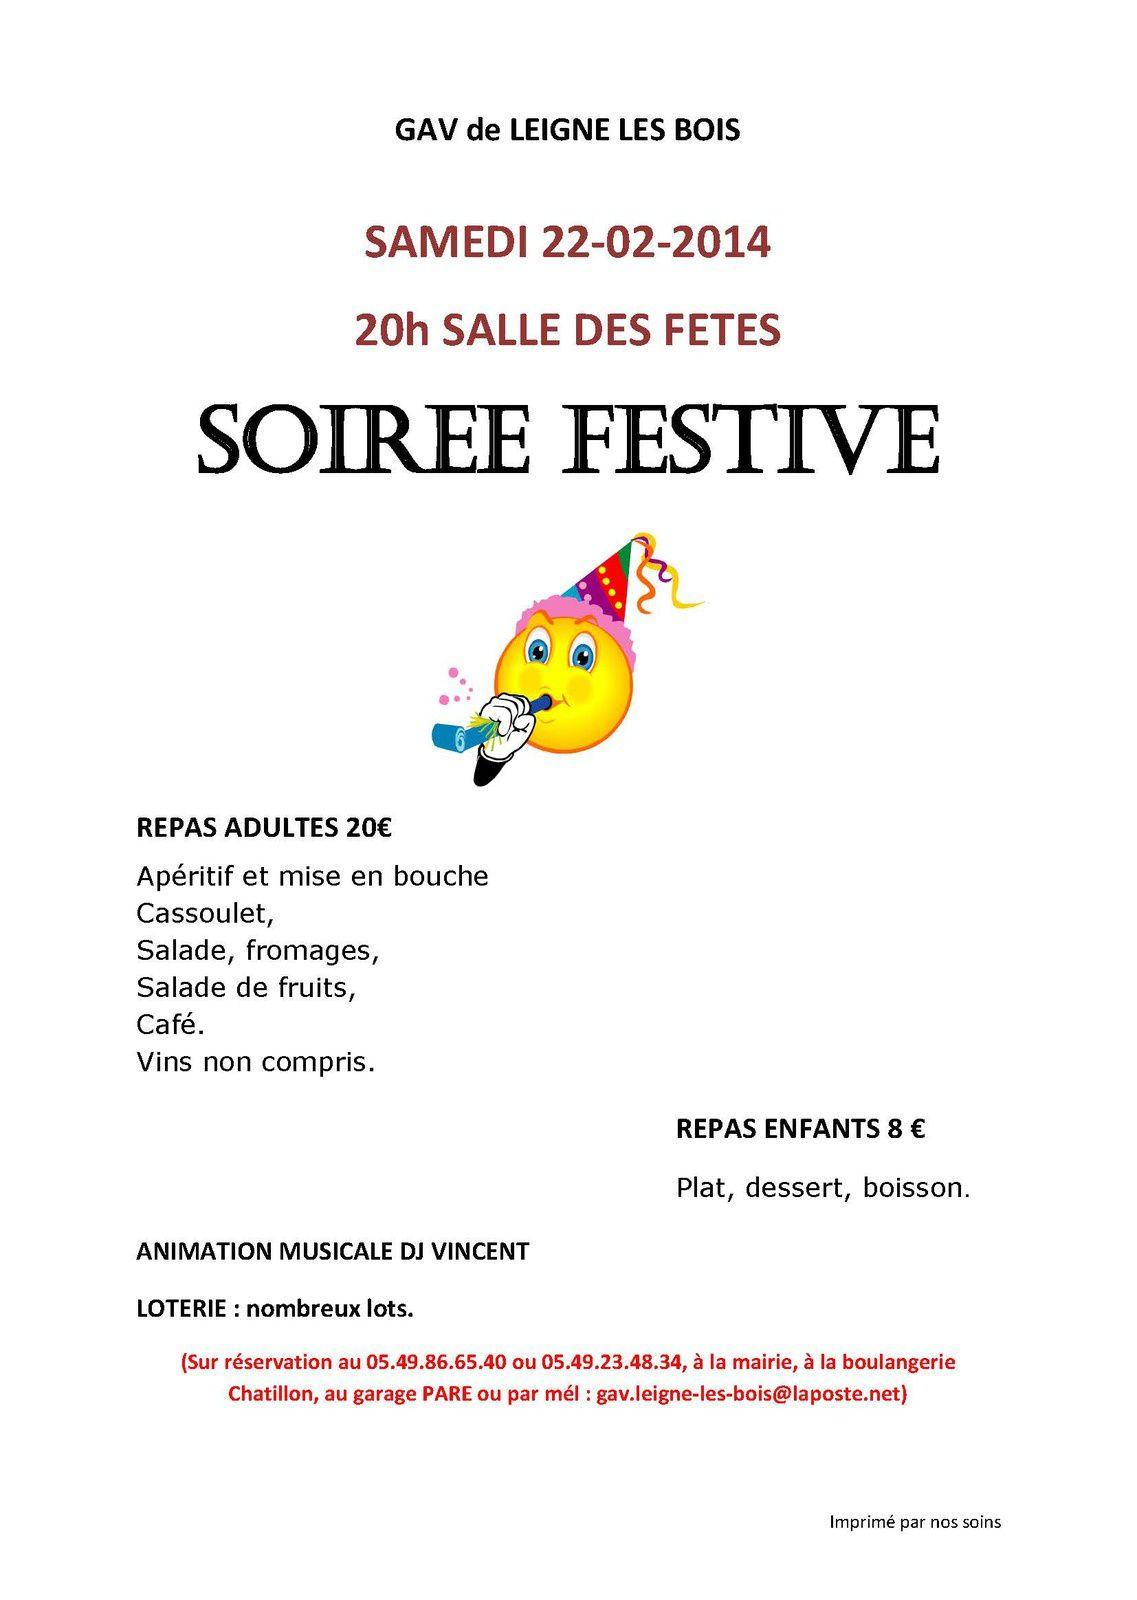 SOIREE FESTIVE samedi 22 février